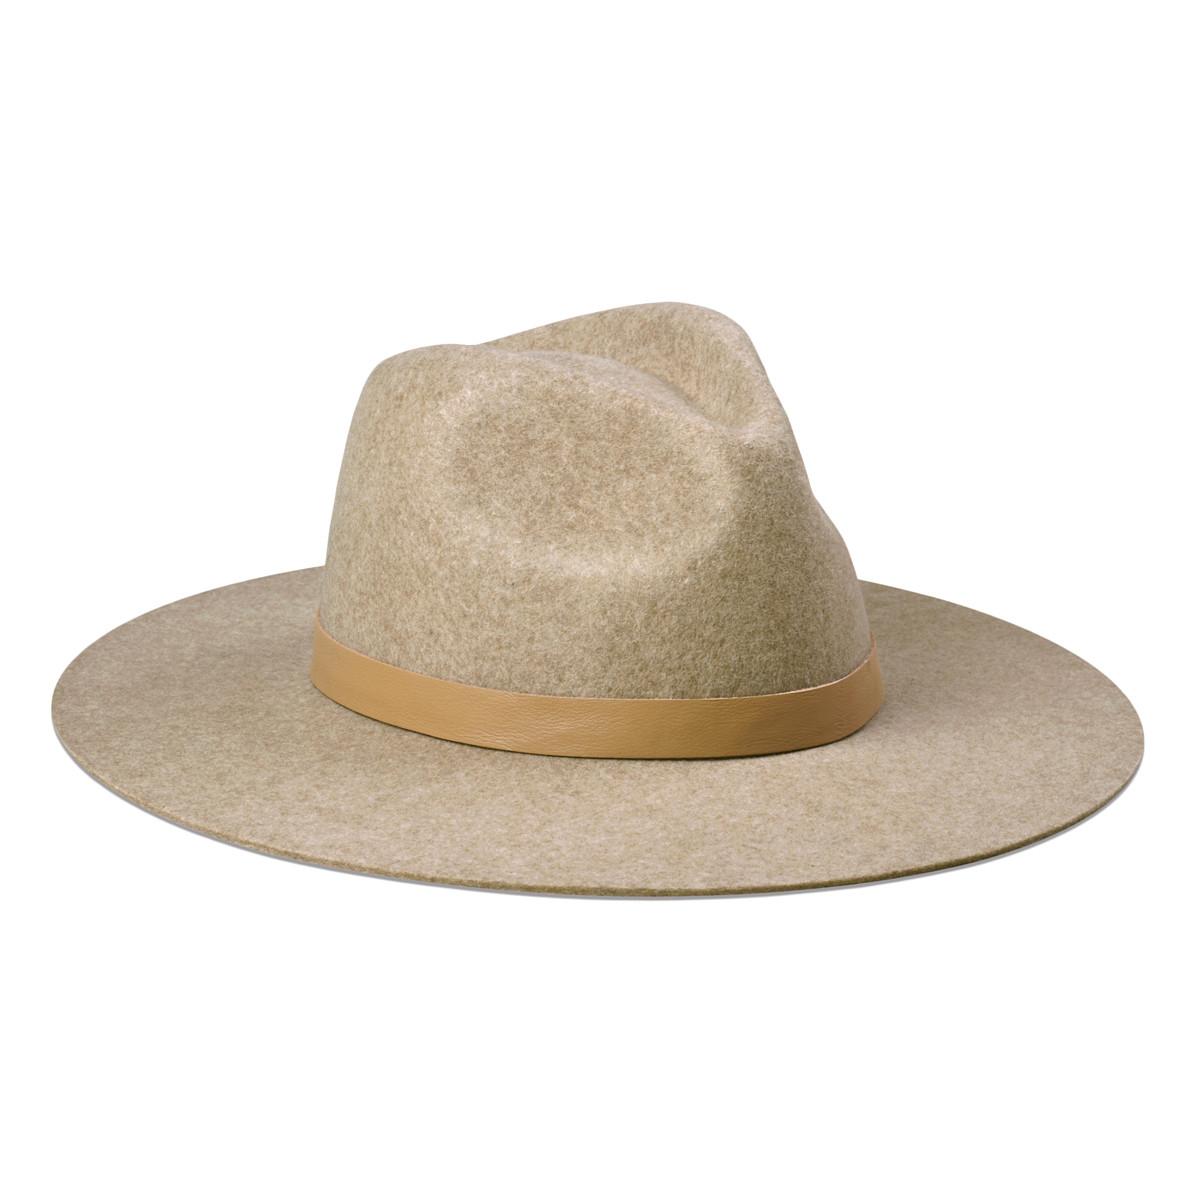 Lack of Color Carlo hat